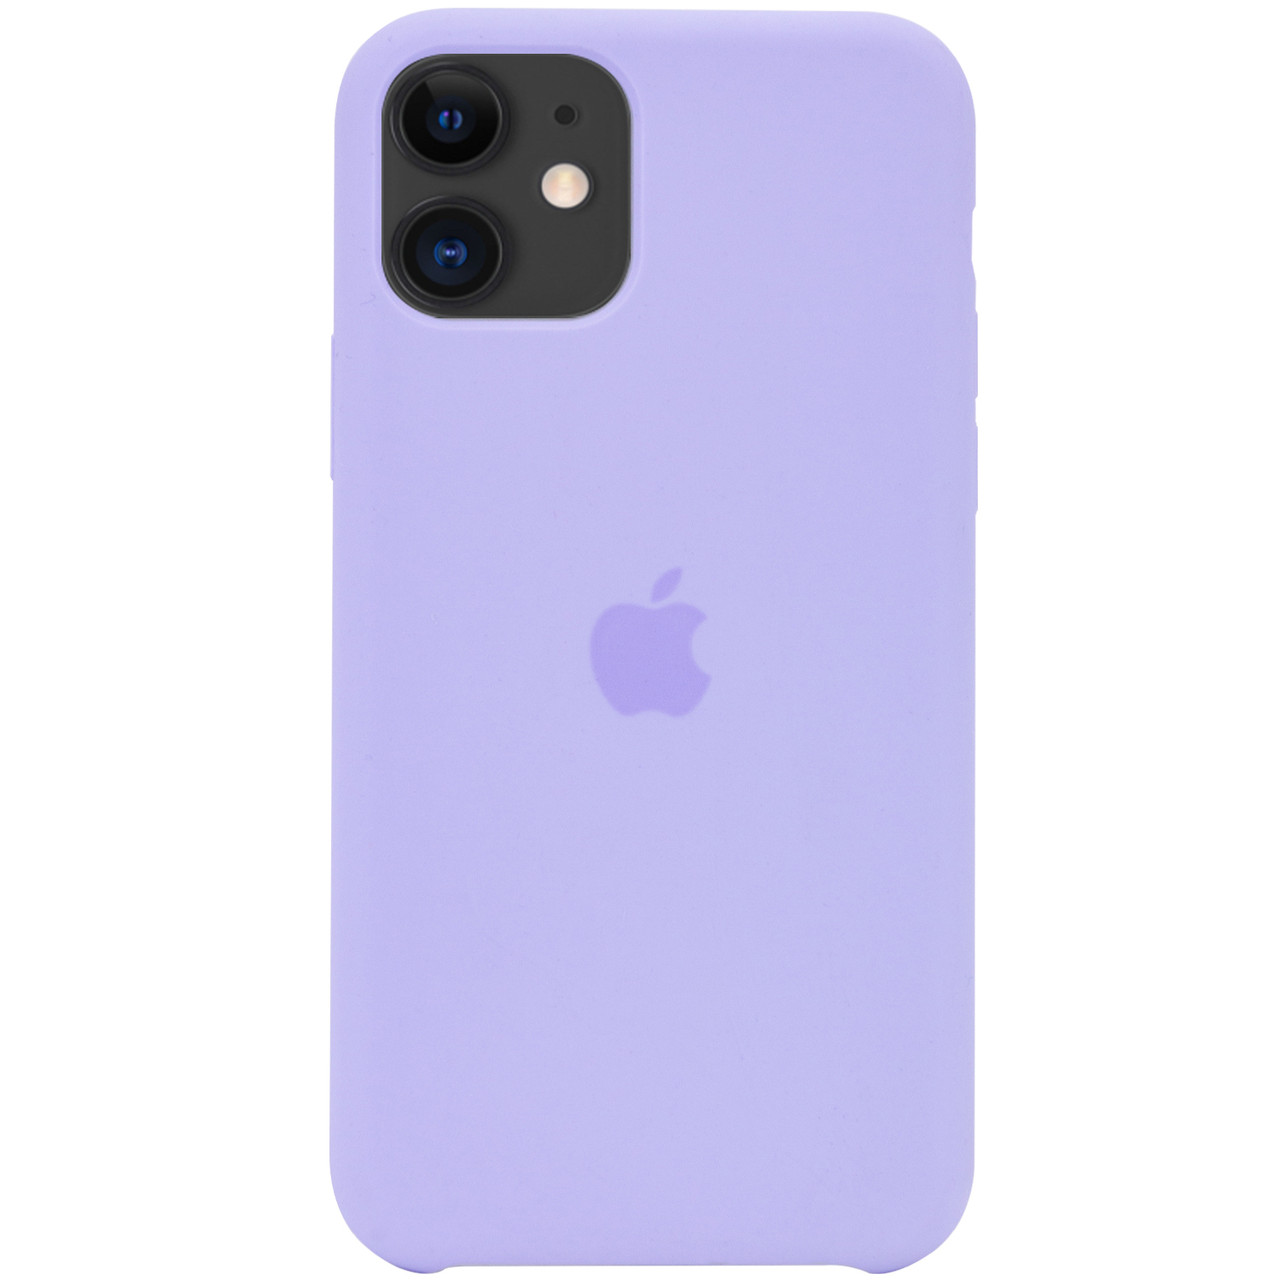 "Чехол Silicone Case (AA) для Apple iPhone 11 (6.1"") Сиреневый / Dasheen"